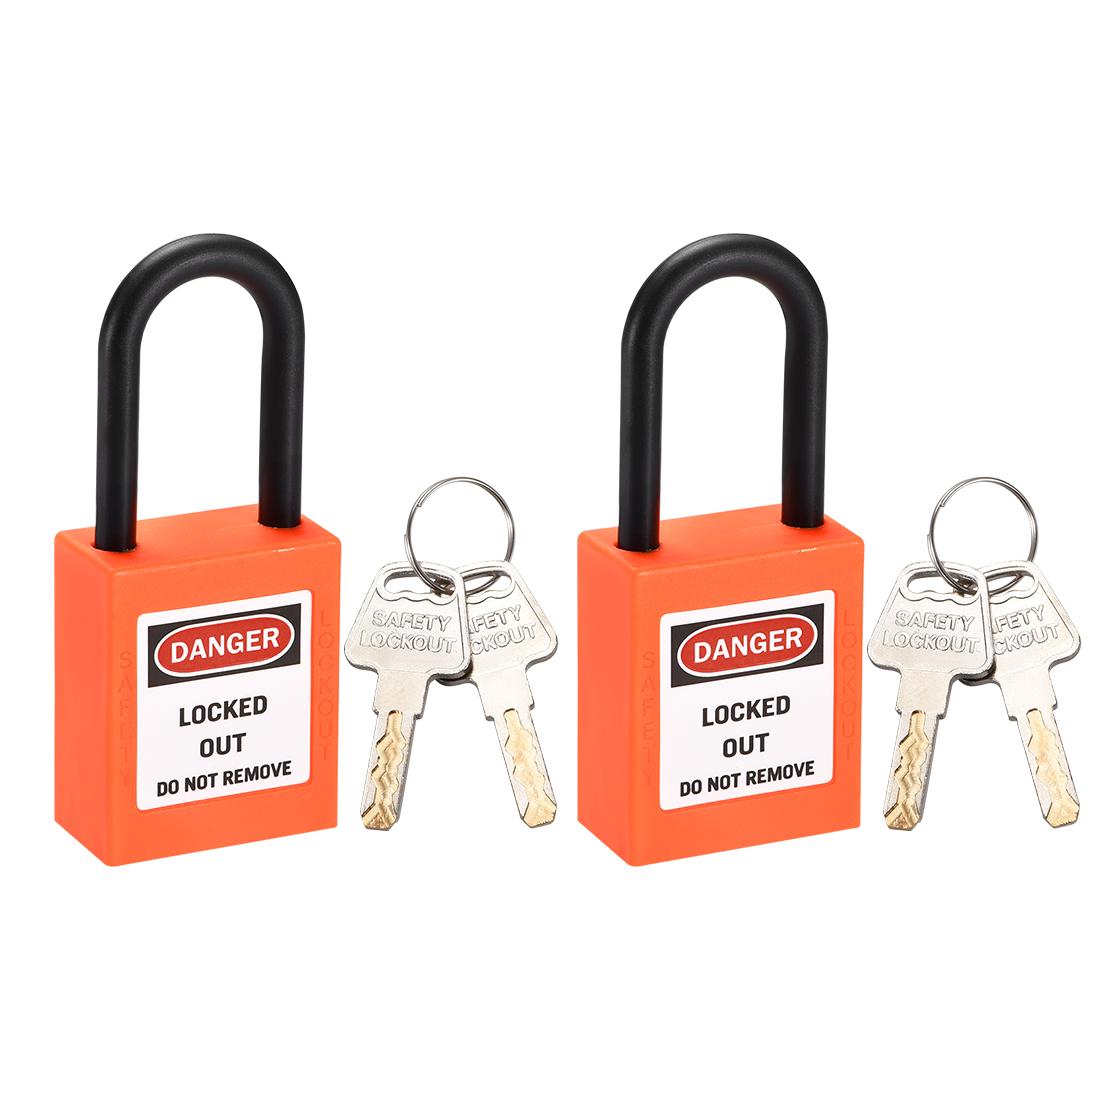 Lockout Tagout Locks,1-1/2 Inch Shackle Key Different Safety Padlock Orange 2pcs